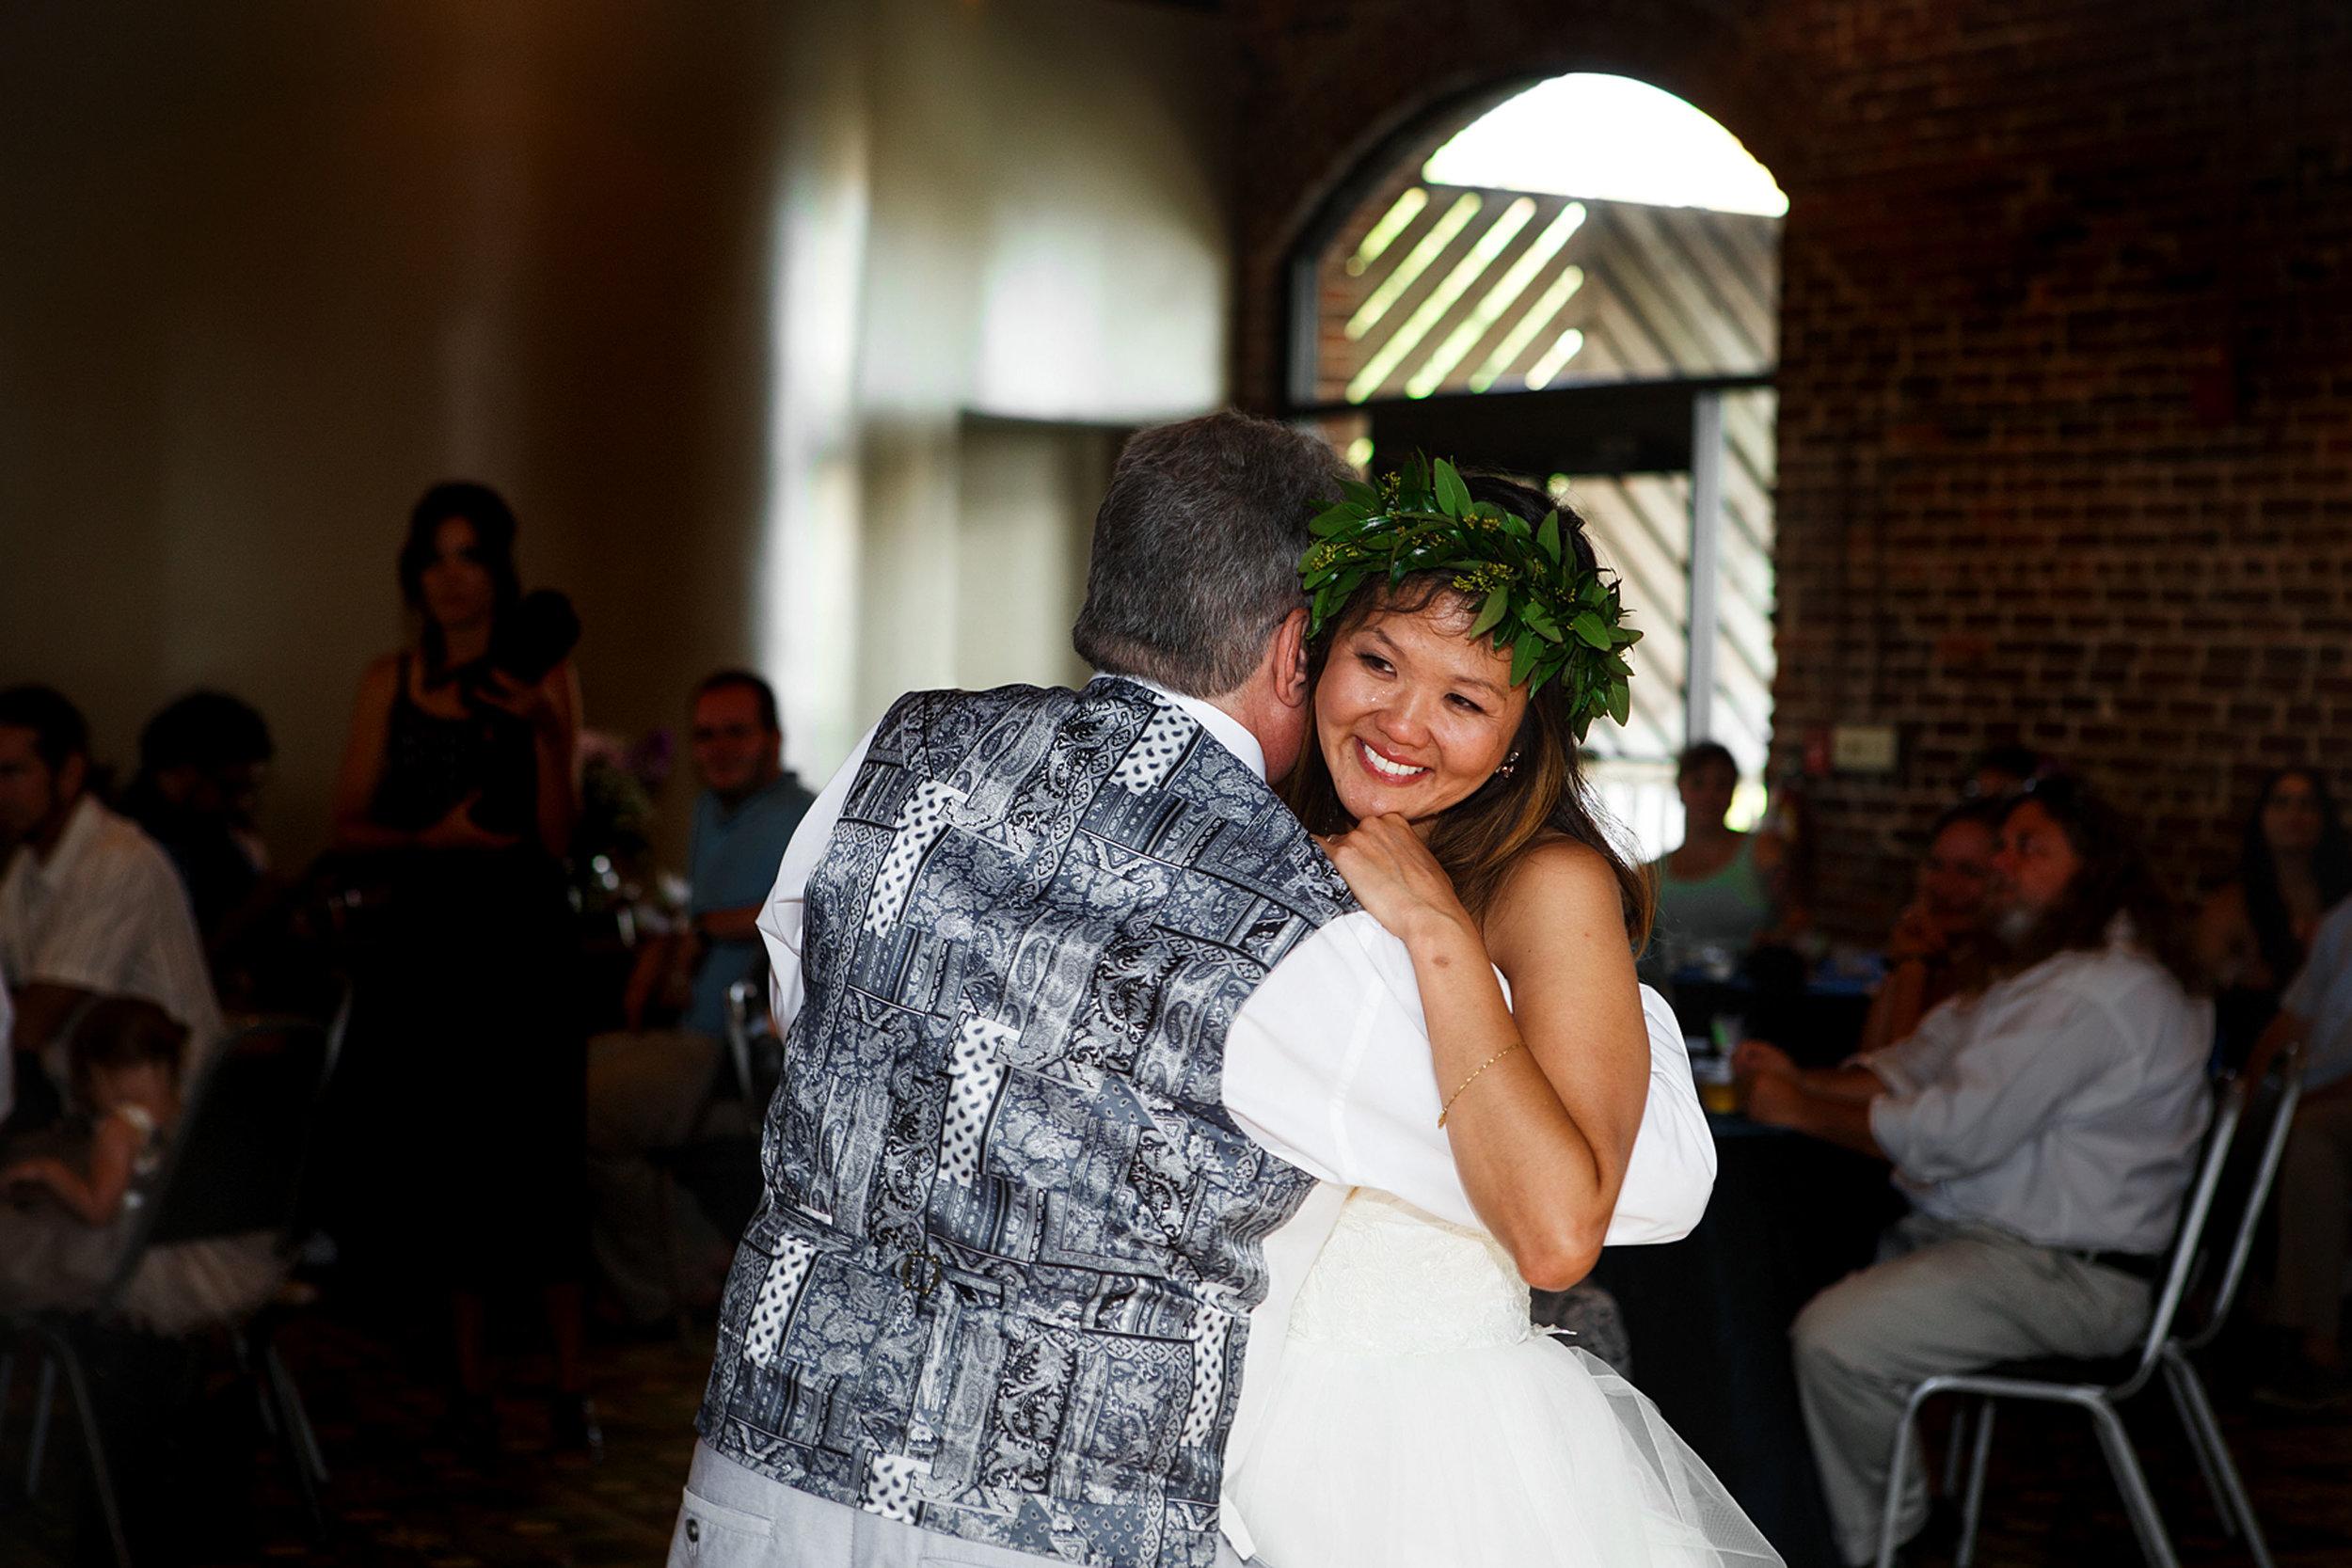 North_Carolina_Wedding_Photographer_Tiffany_Abruzzo_Reception_011.jpg